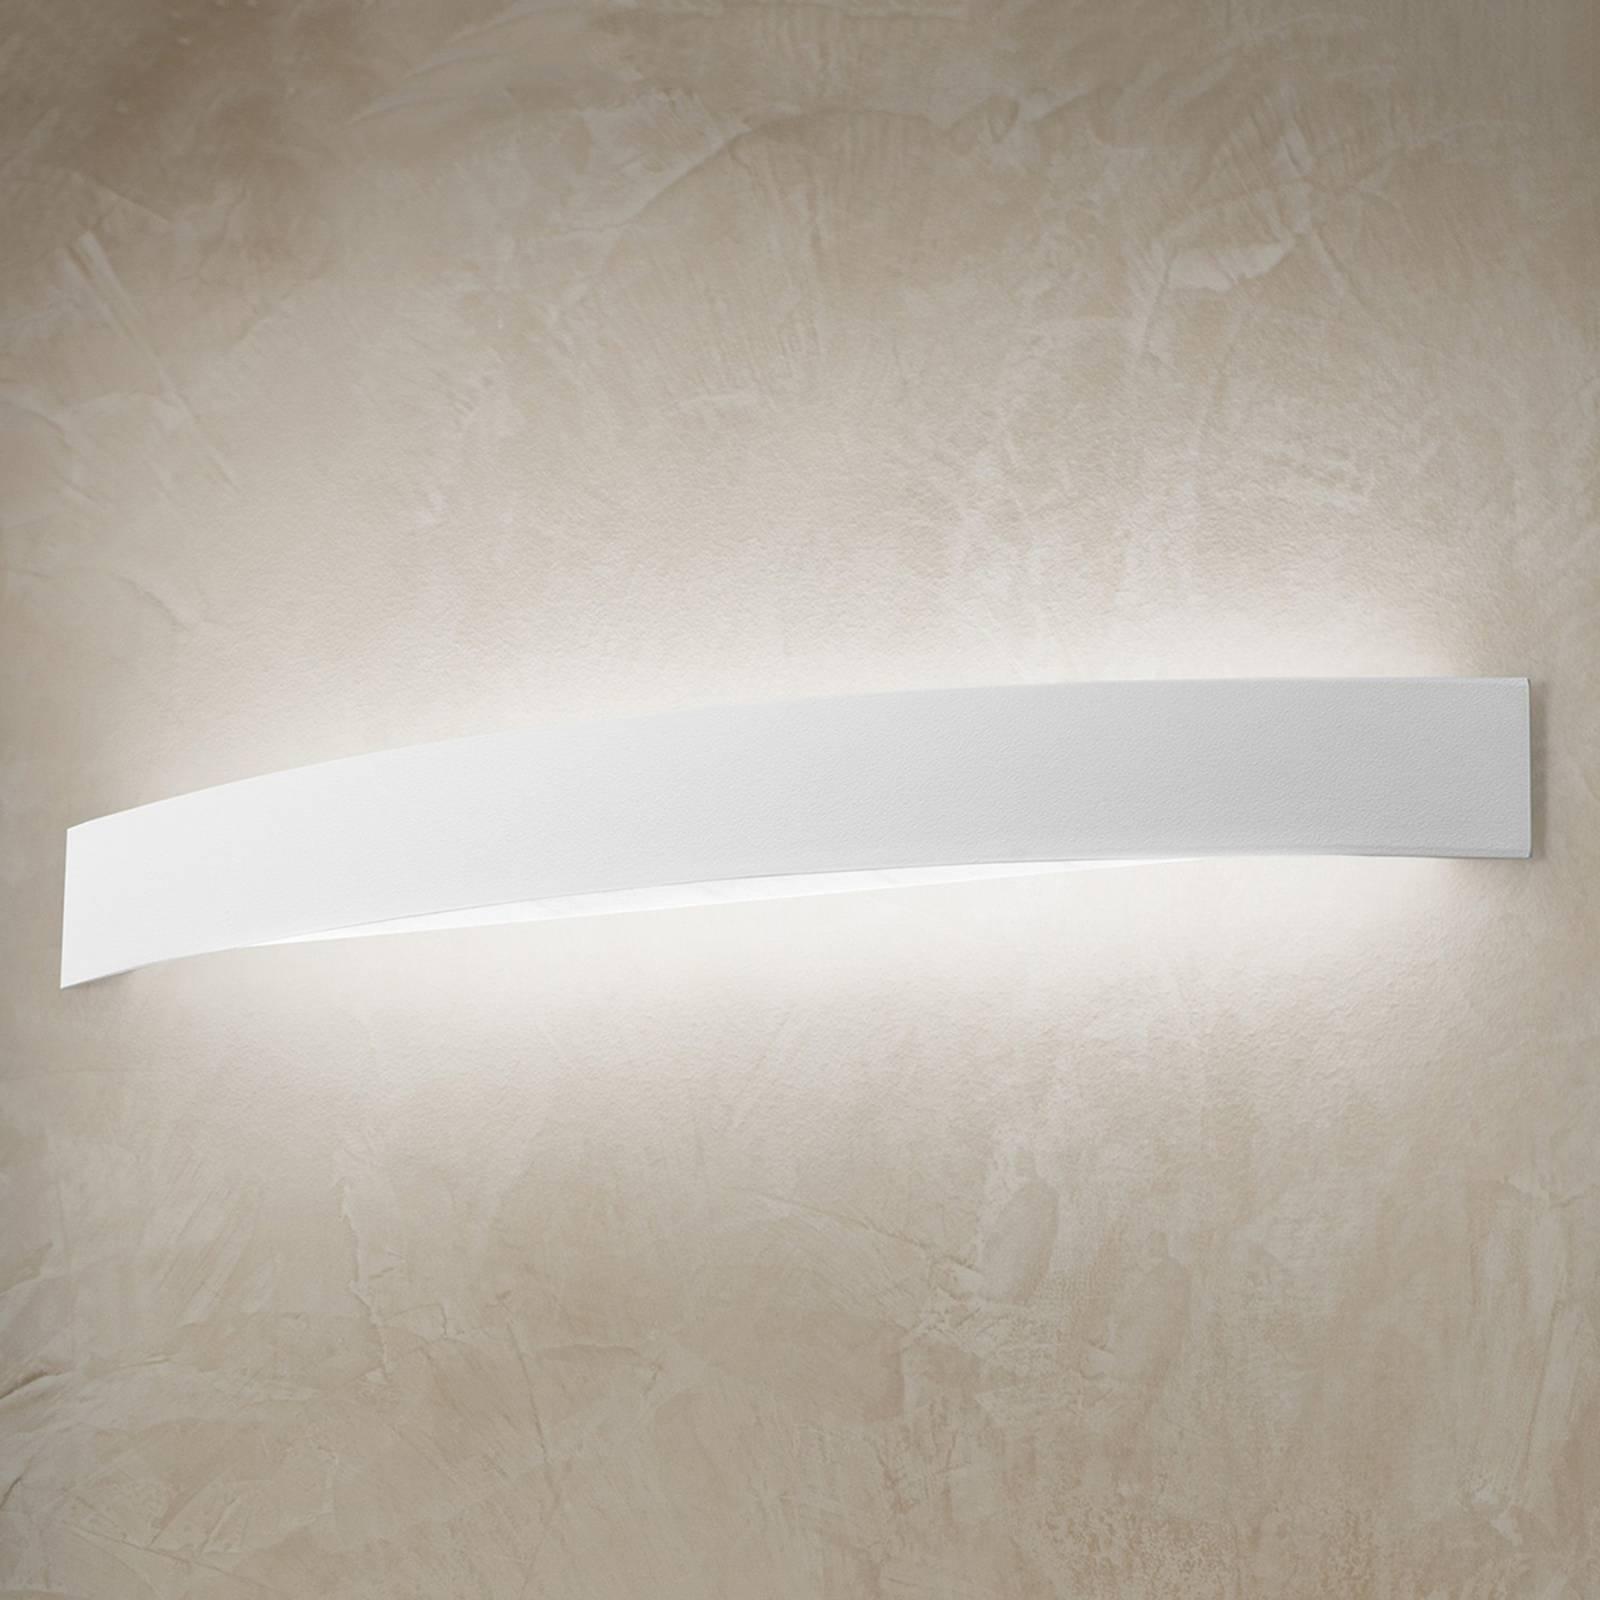 Gebogene LED-Wandleuchte Curve in Weiß